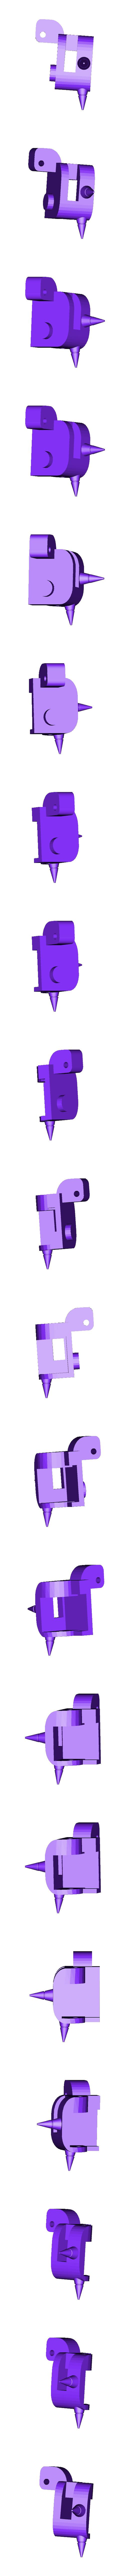 9- G1 ALLICON- Right Shoulder.stl Download STL file Transformers G1 Allicon (11cm Scale) • 3D print object, mmshightail